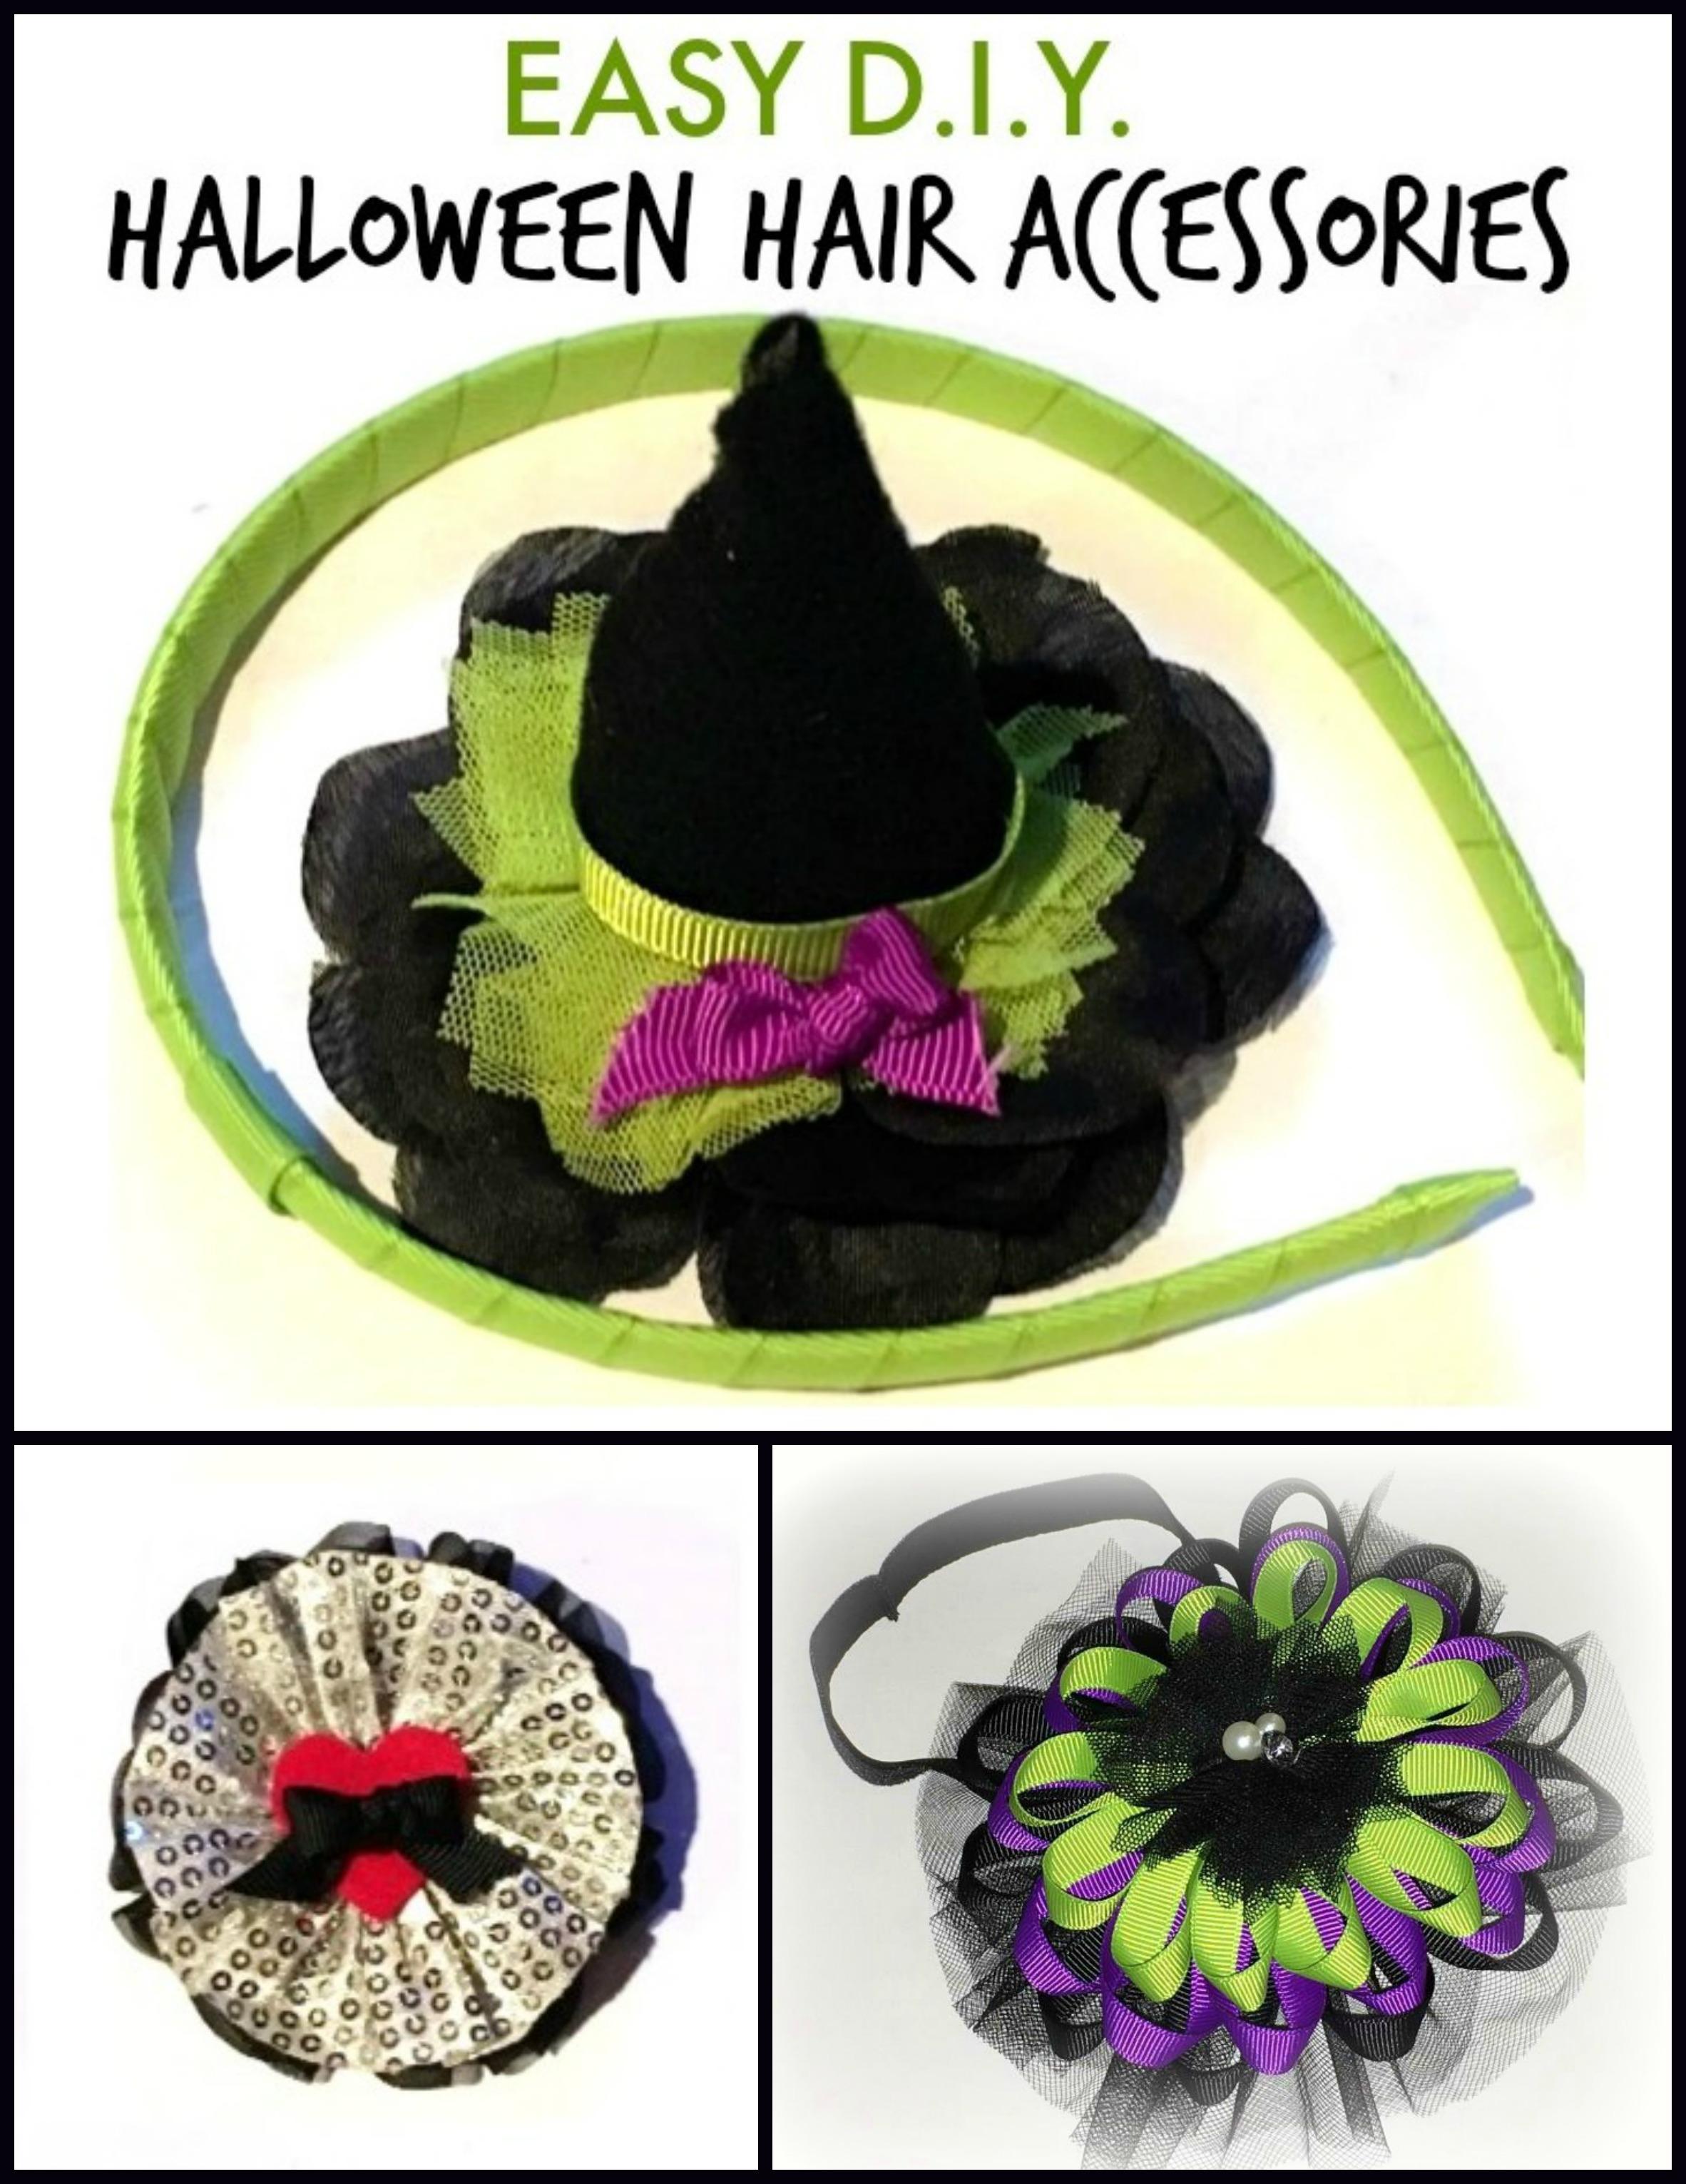 halloween hair accessories | 3 easy crafting tutorialsthe hair